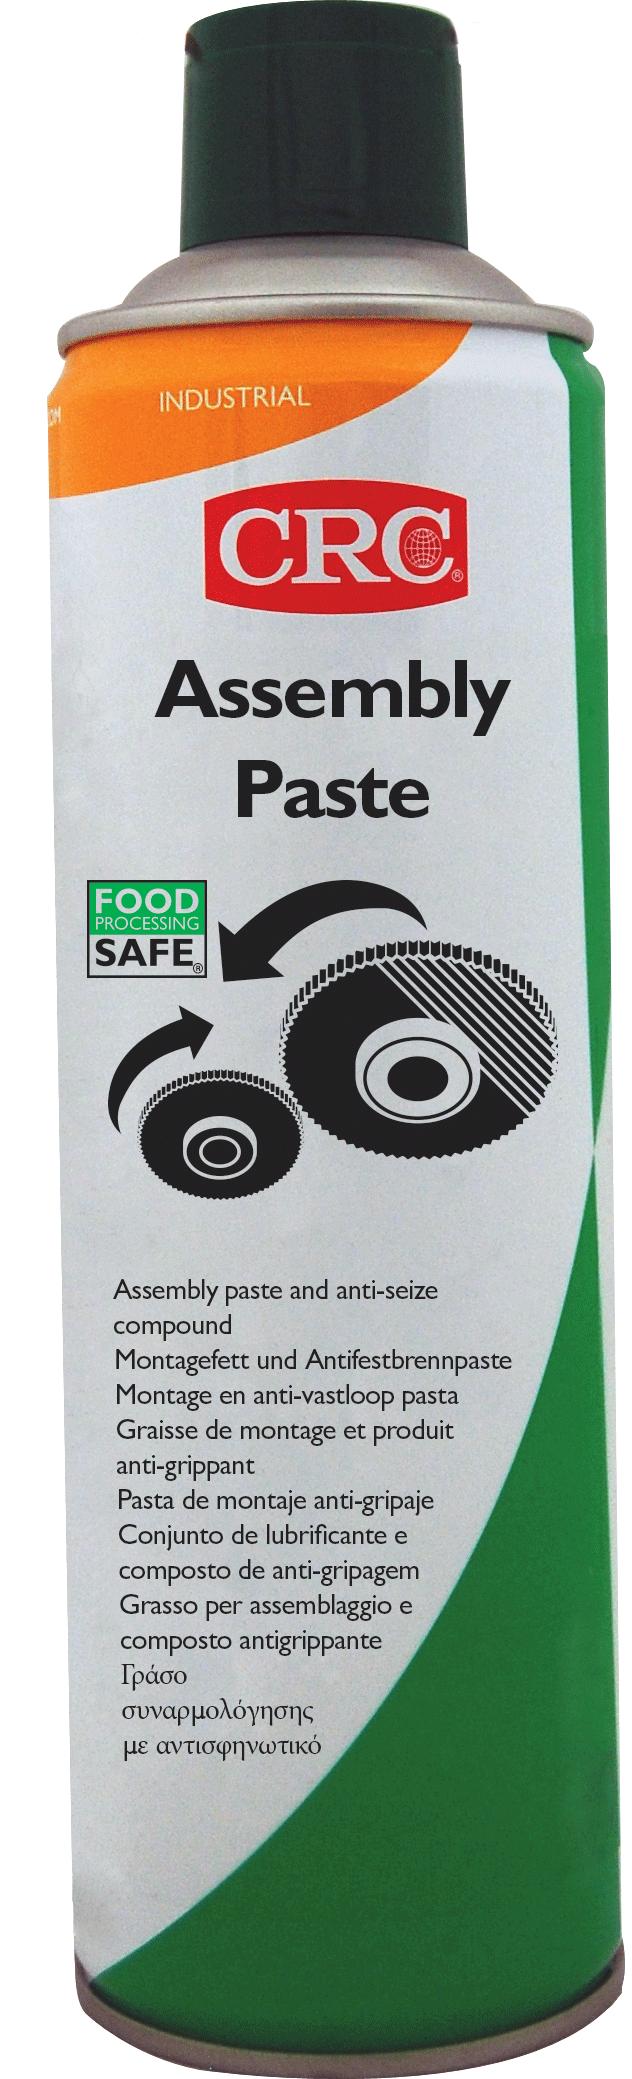 Afbeelding van crc industry fps assembly paste 500 ml, spuitbus